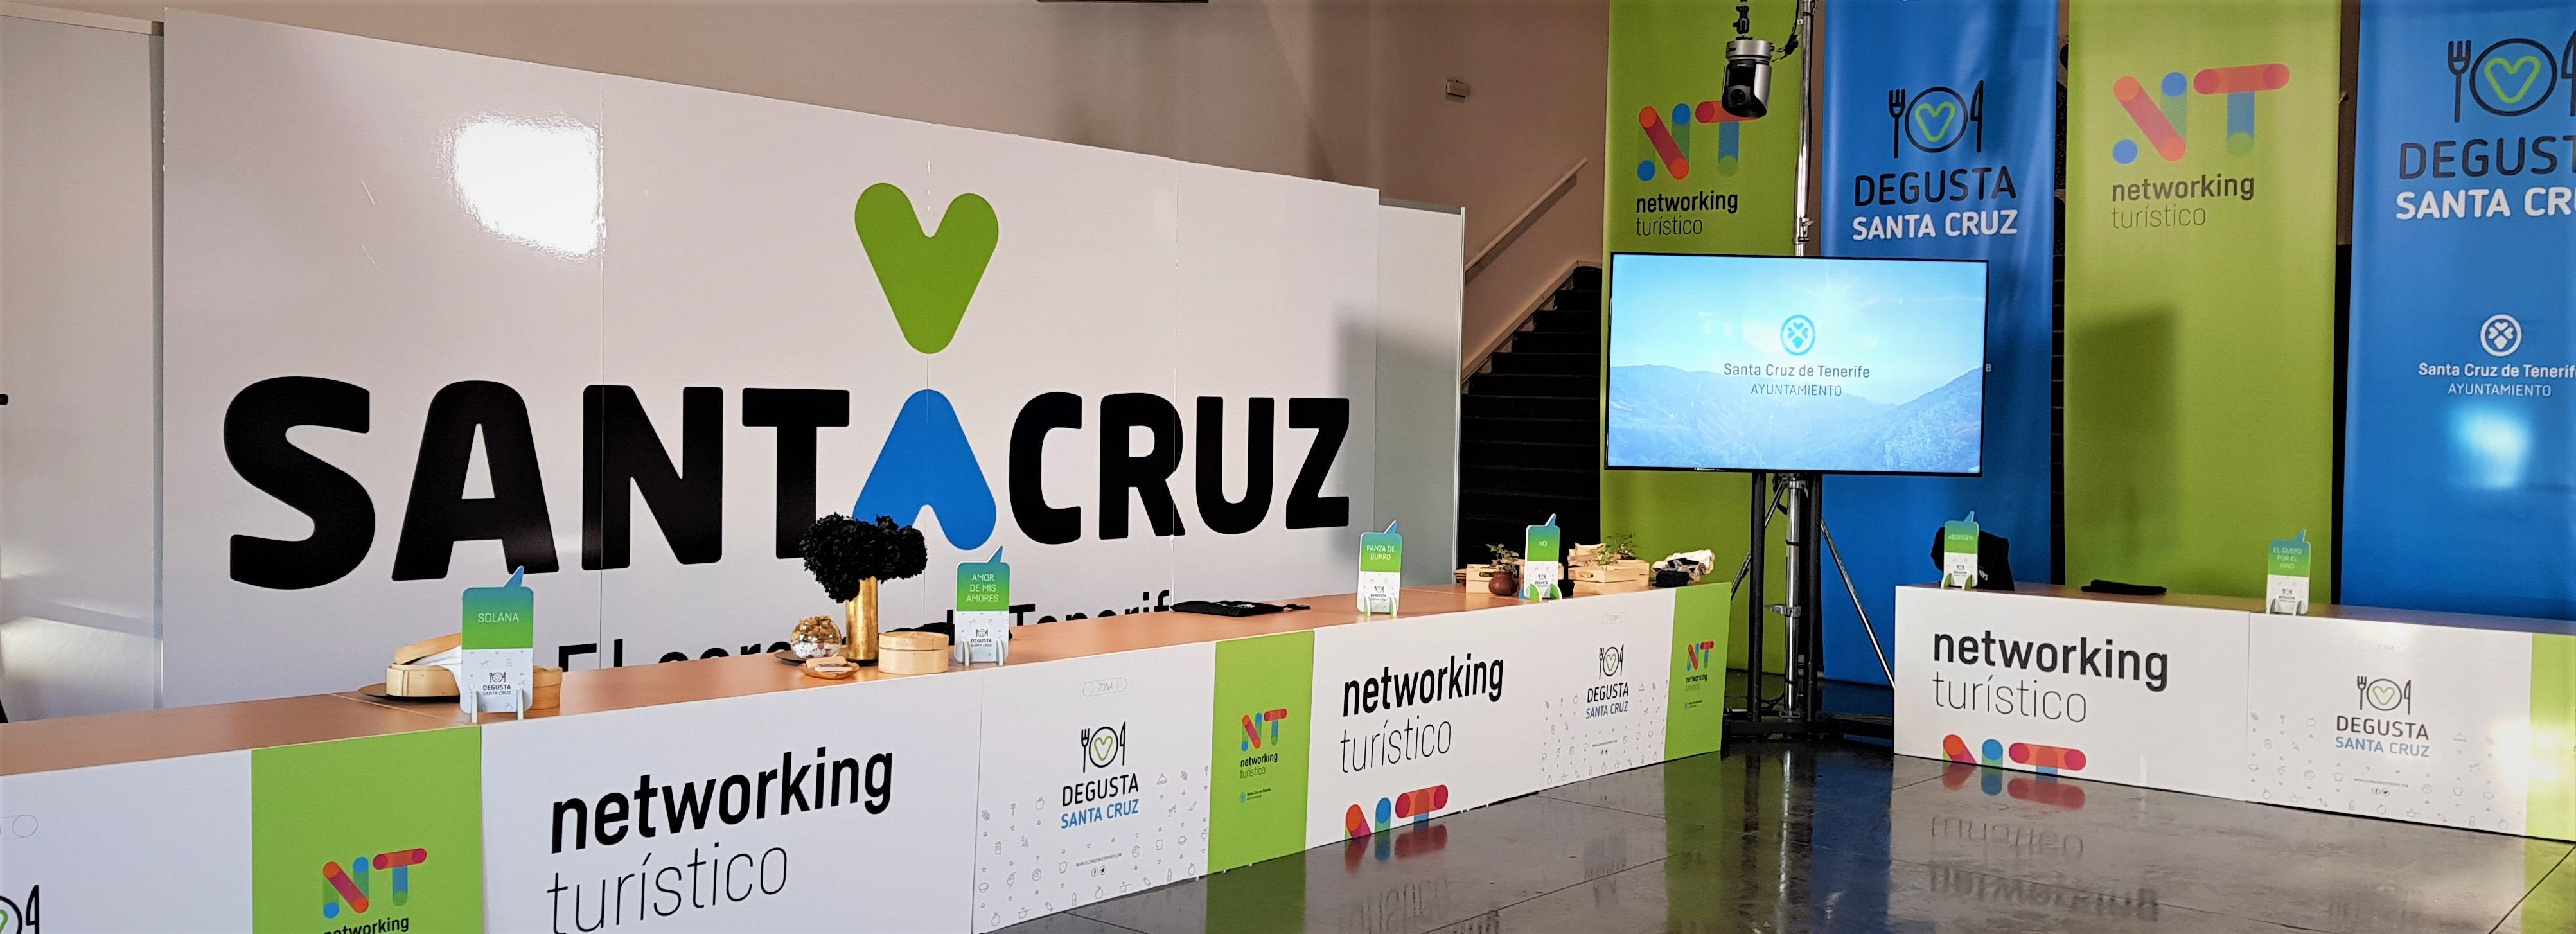 III Networking Turistico en Santa Cruz de Tenerife, con Degusta Santa Cruz